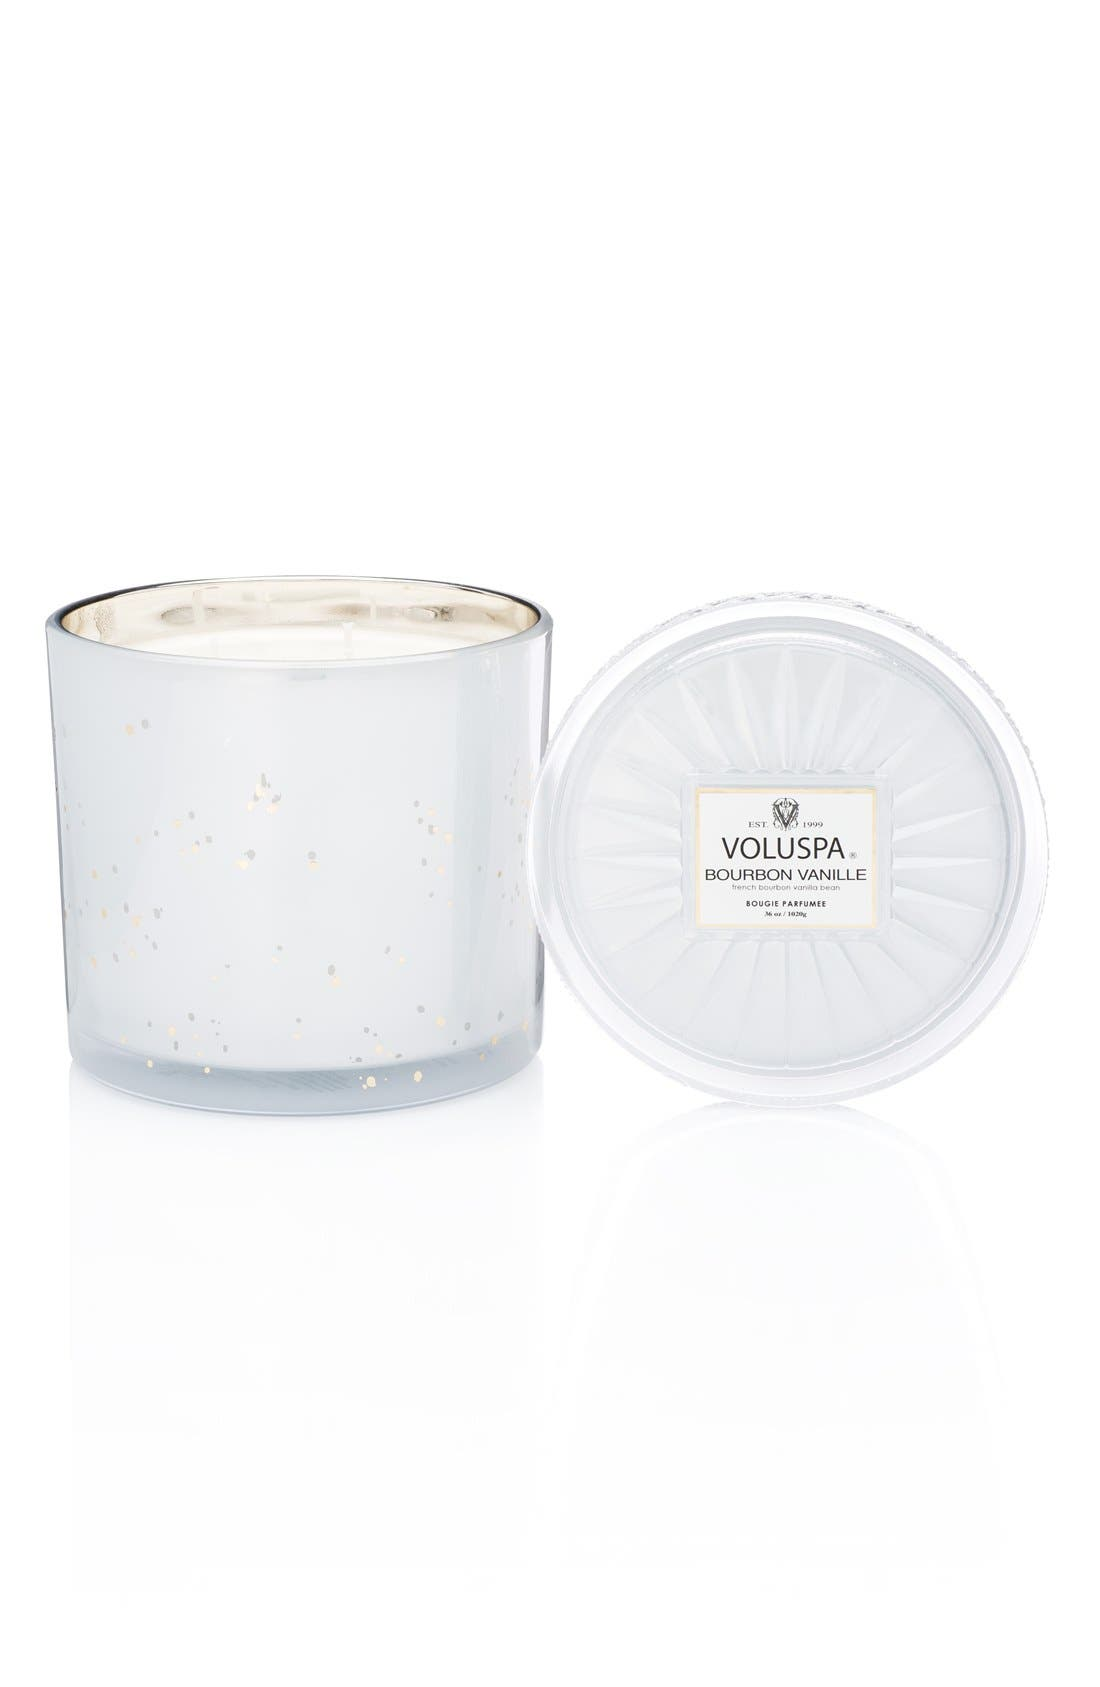 Voluspa 'Vermeil - French Bourbon Vanille' GrandeMaisonCandle